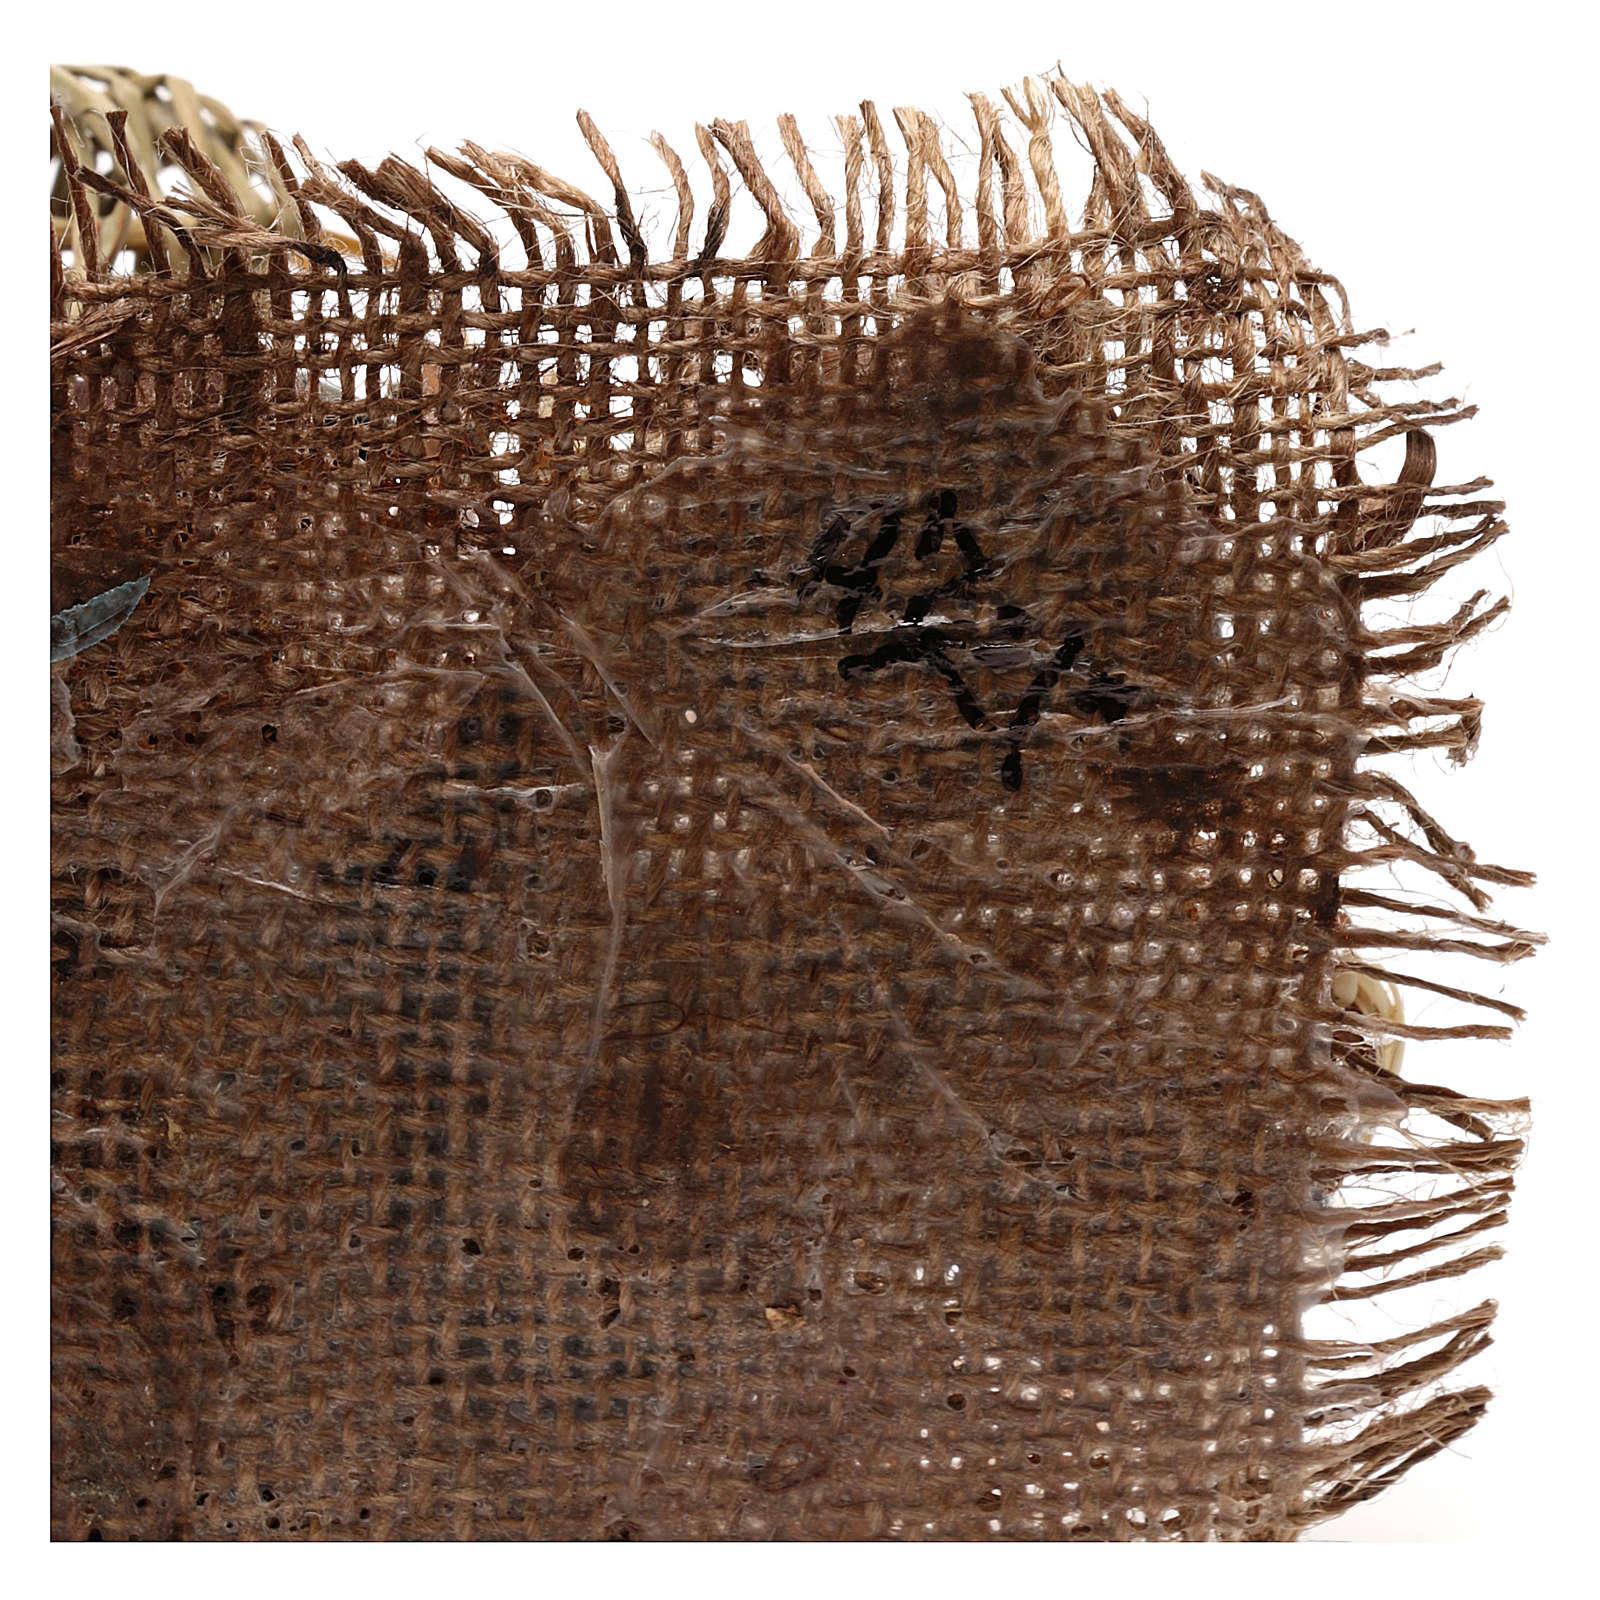 Cestaio per presepe 18 cm Angela Tripi 4